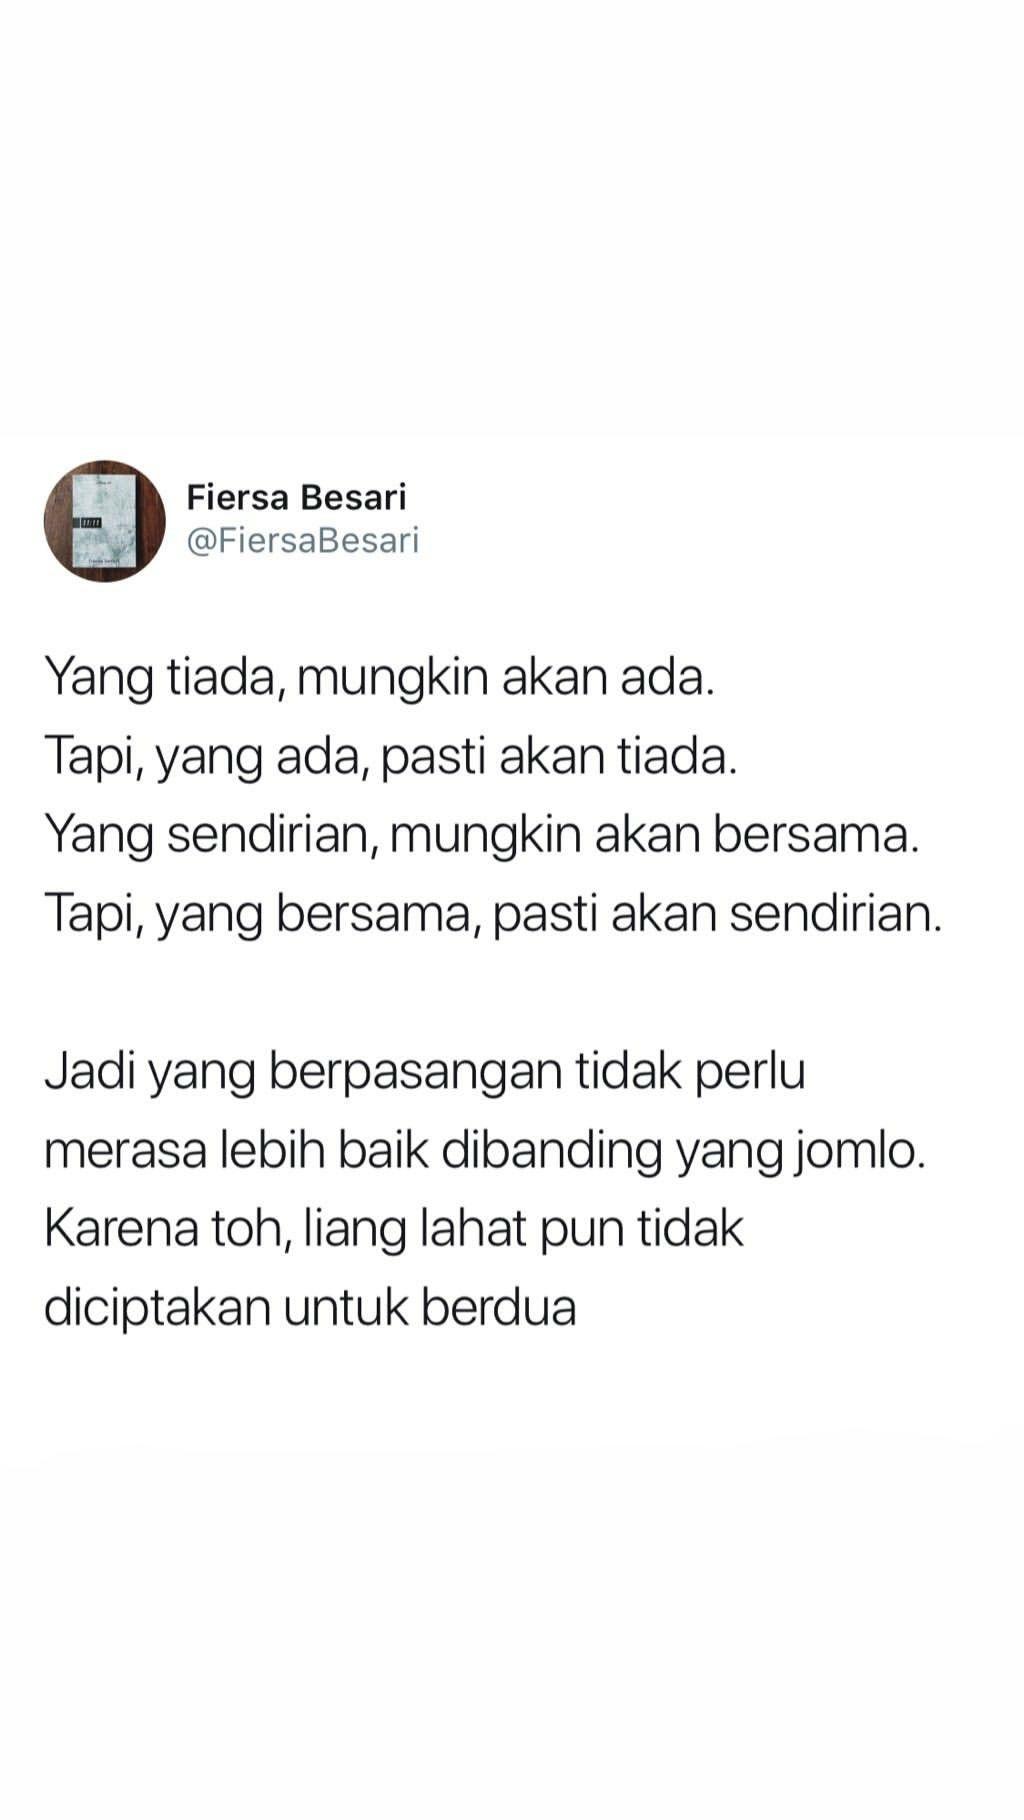 Kata Kata Fiersa Besari Uploaded by user